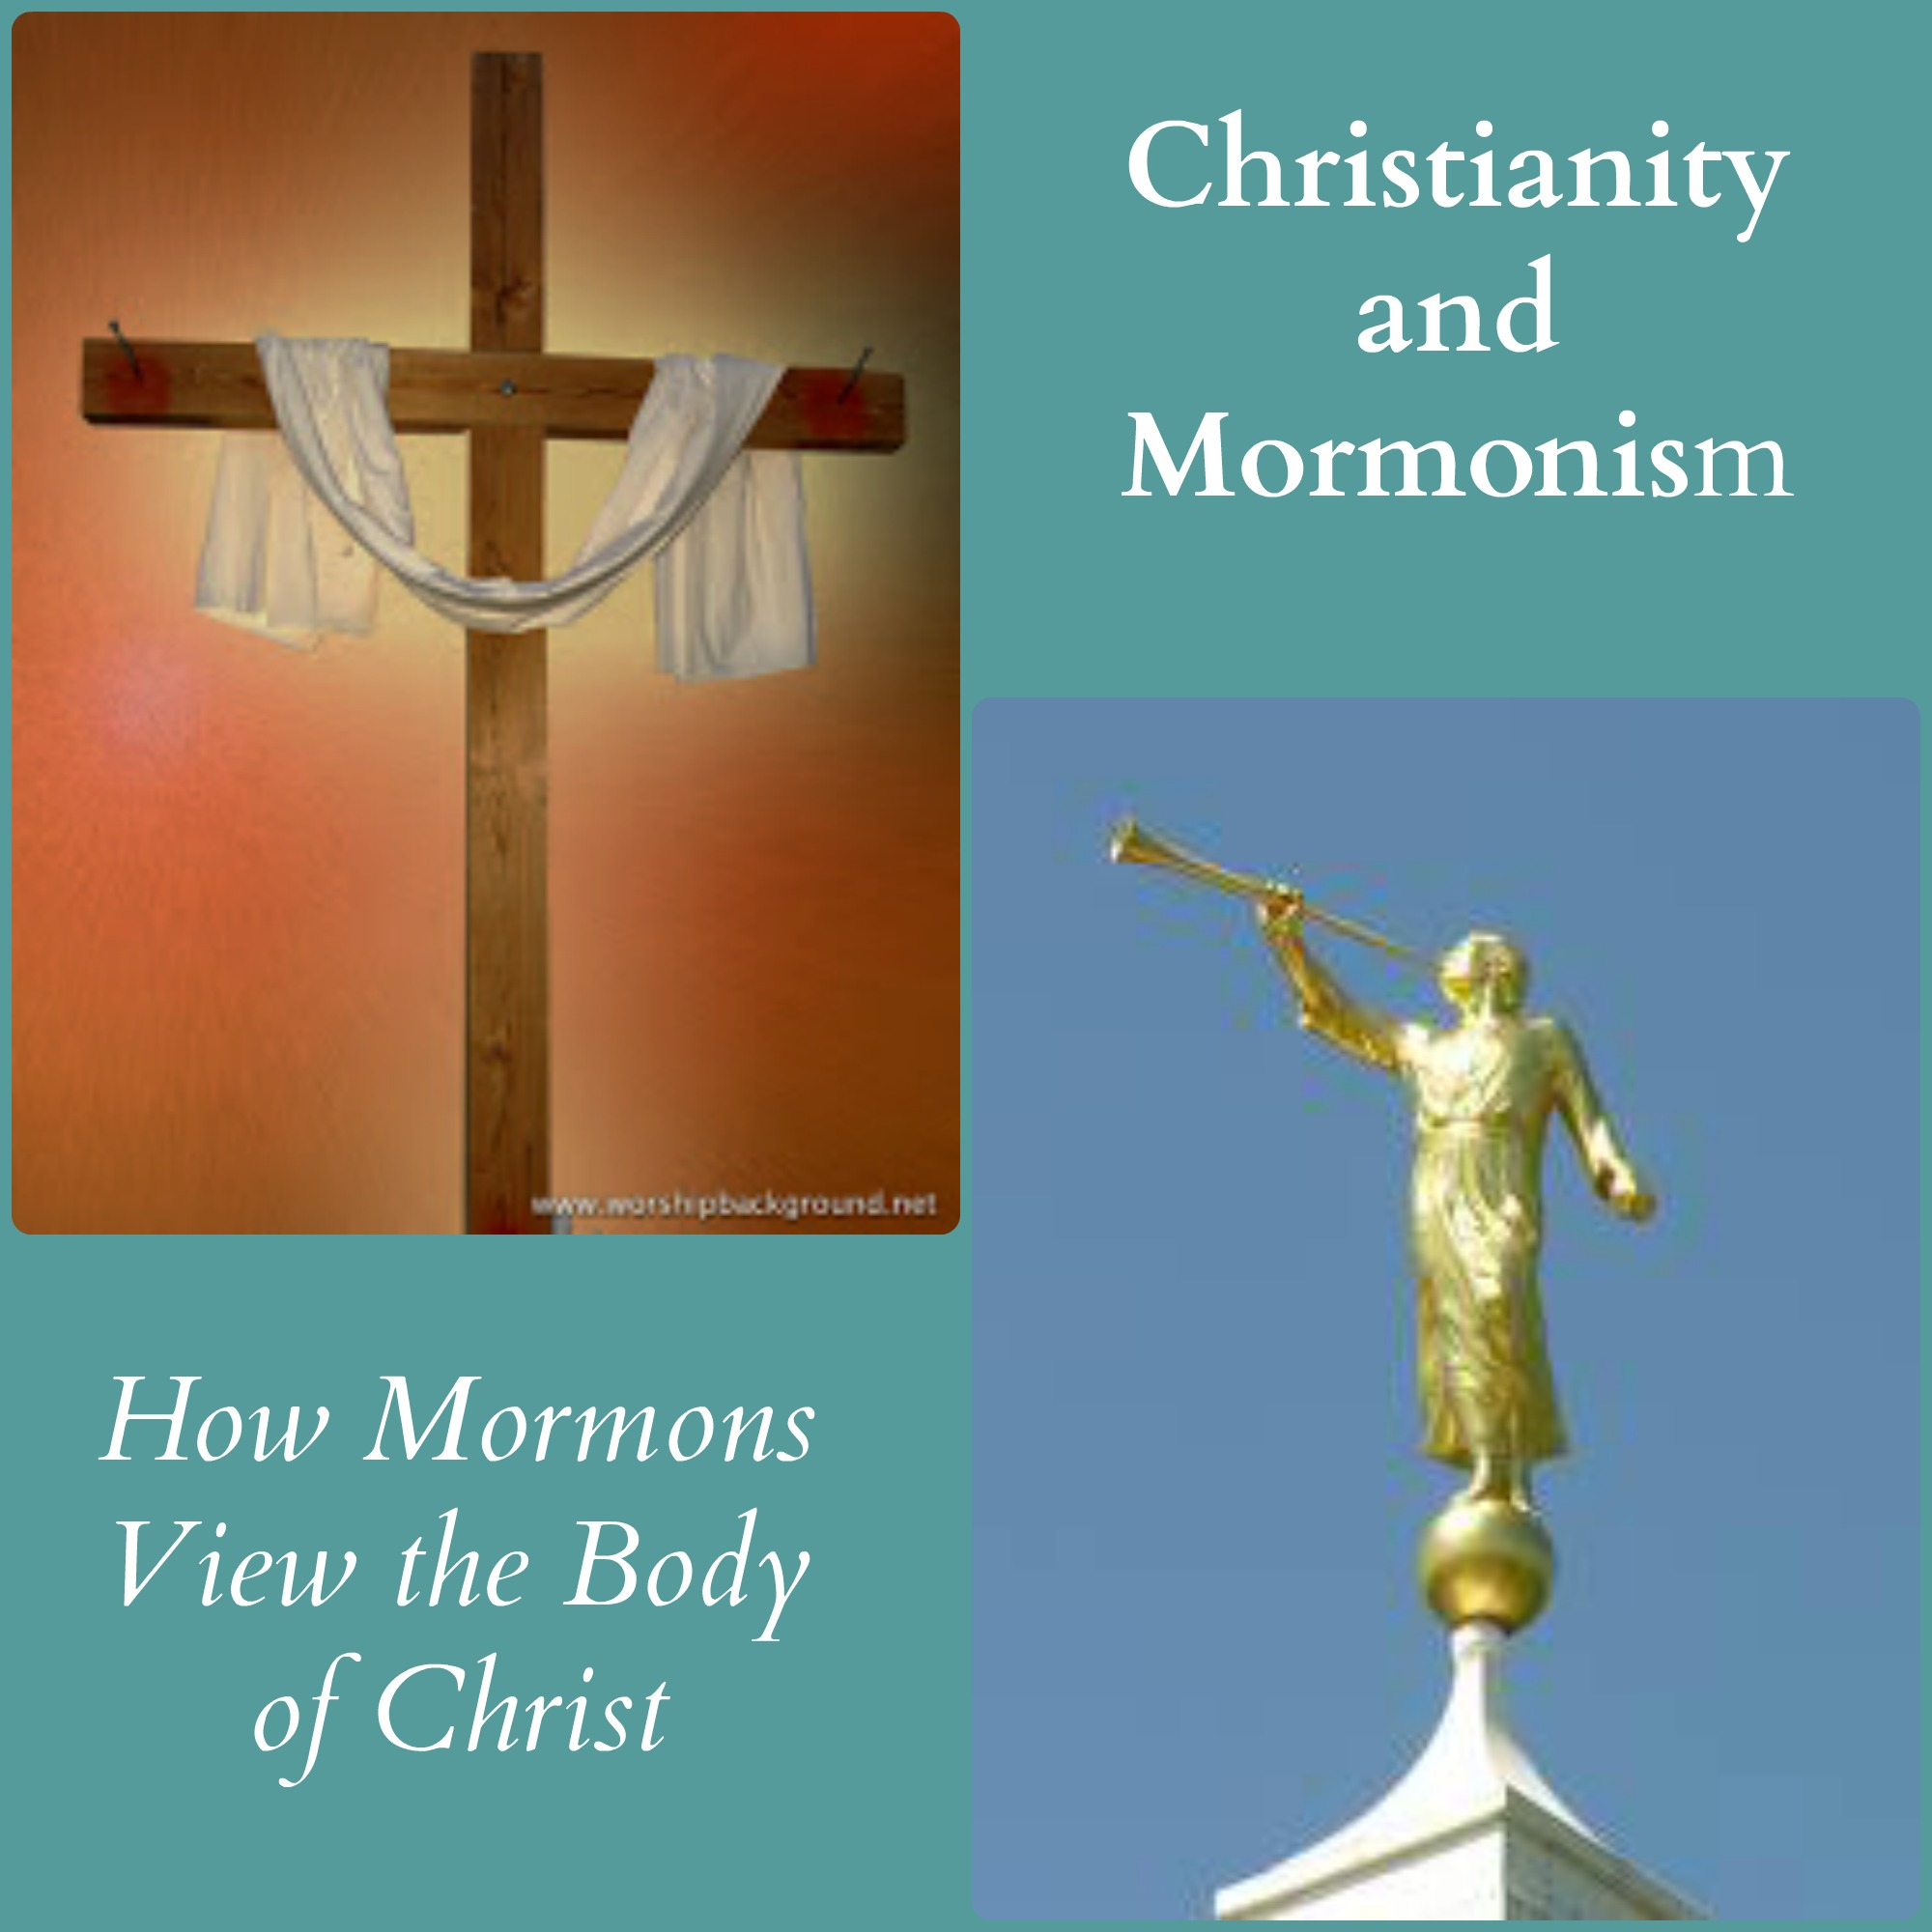 Presbyterians and Mormons